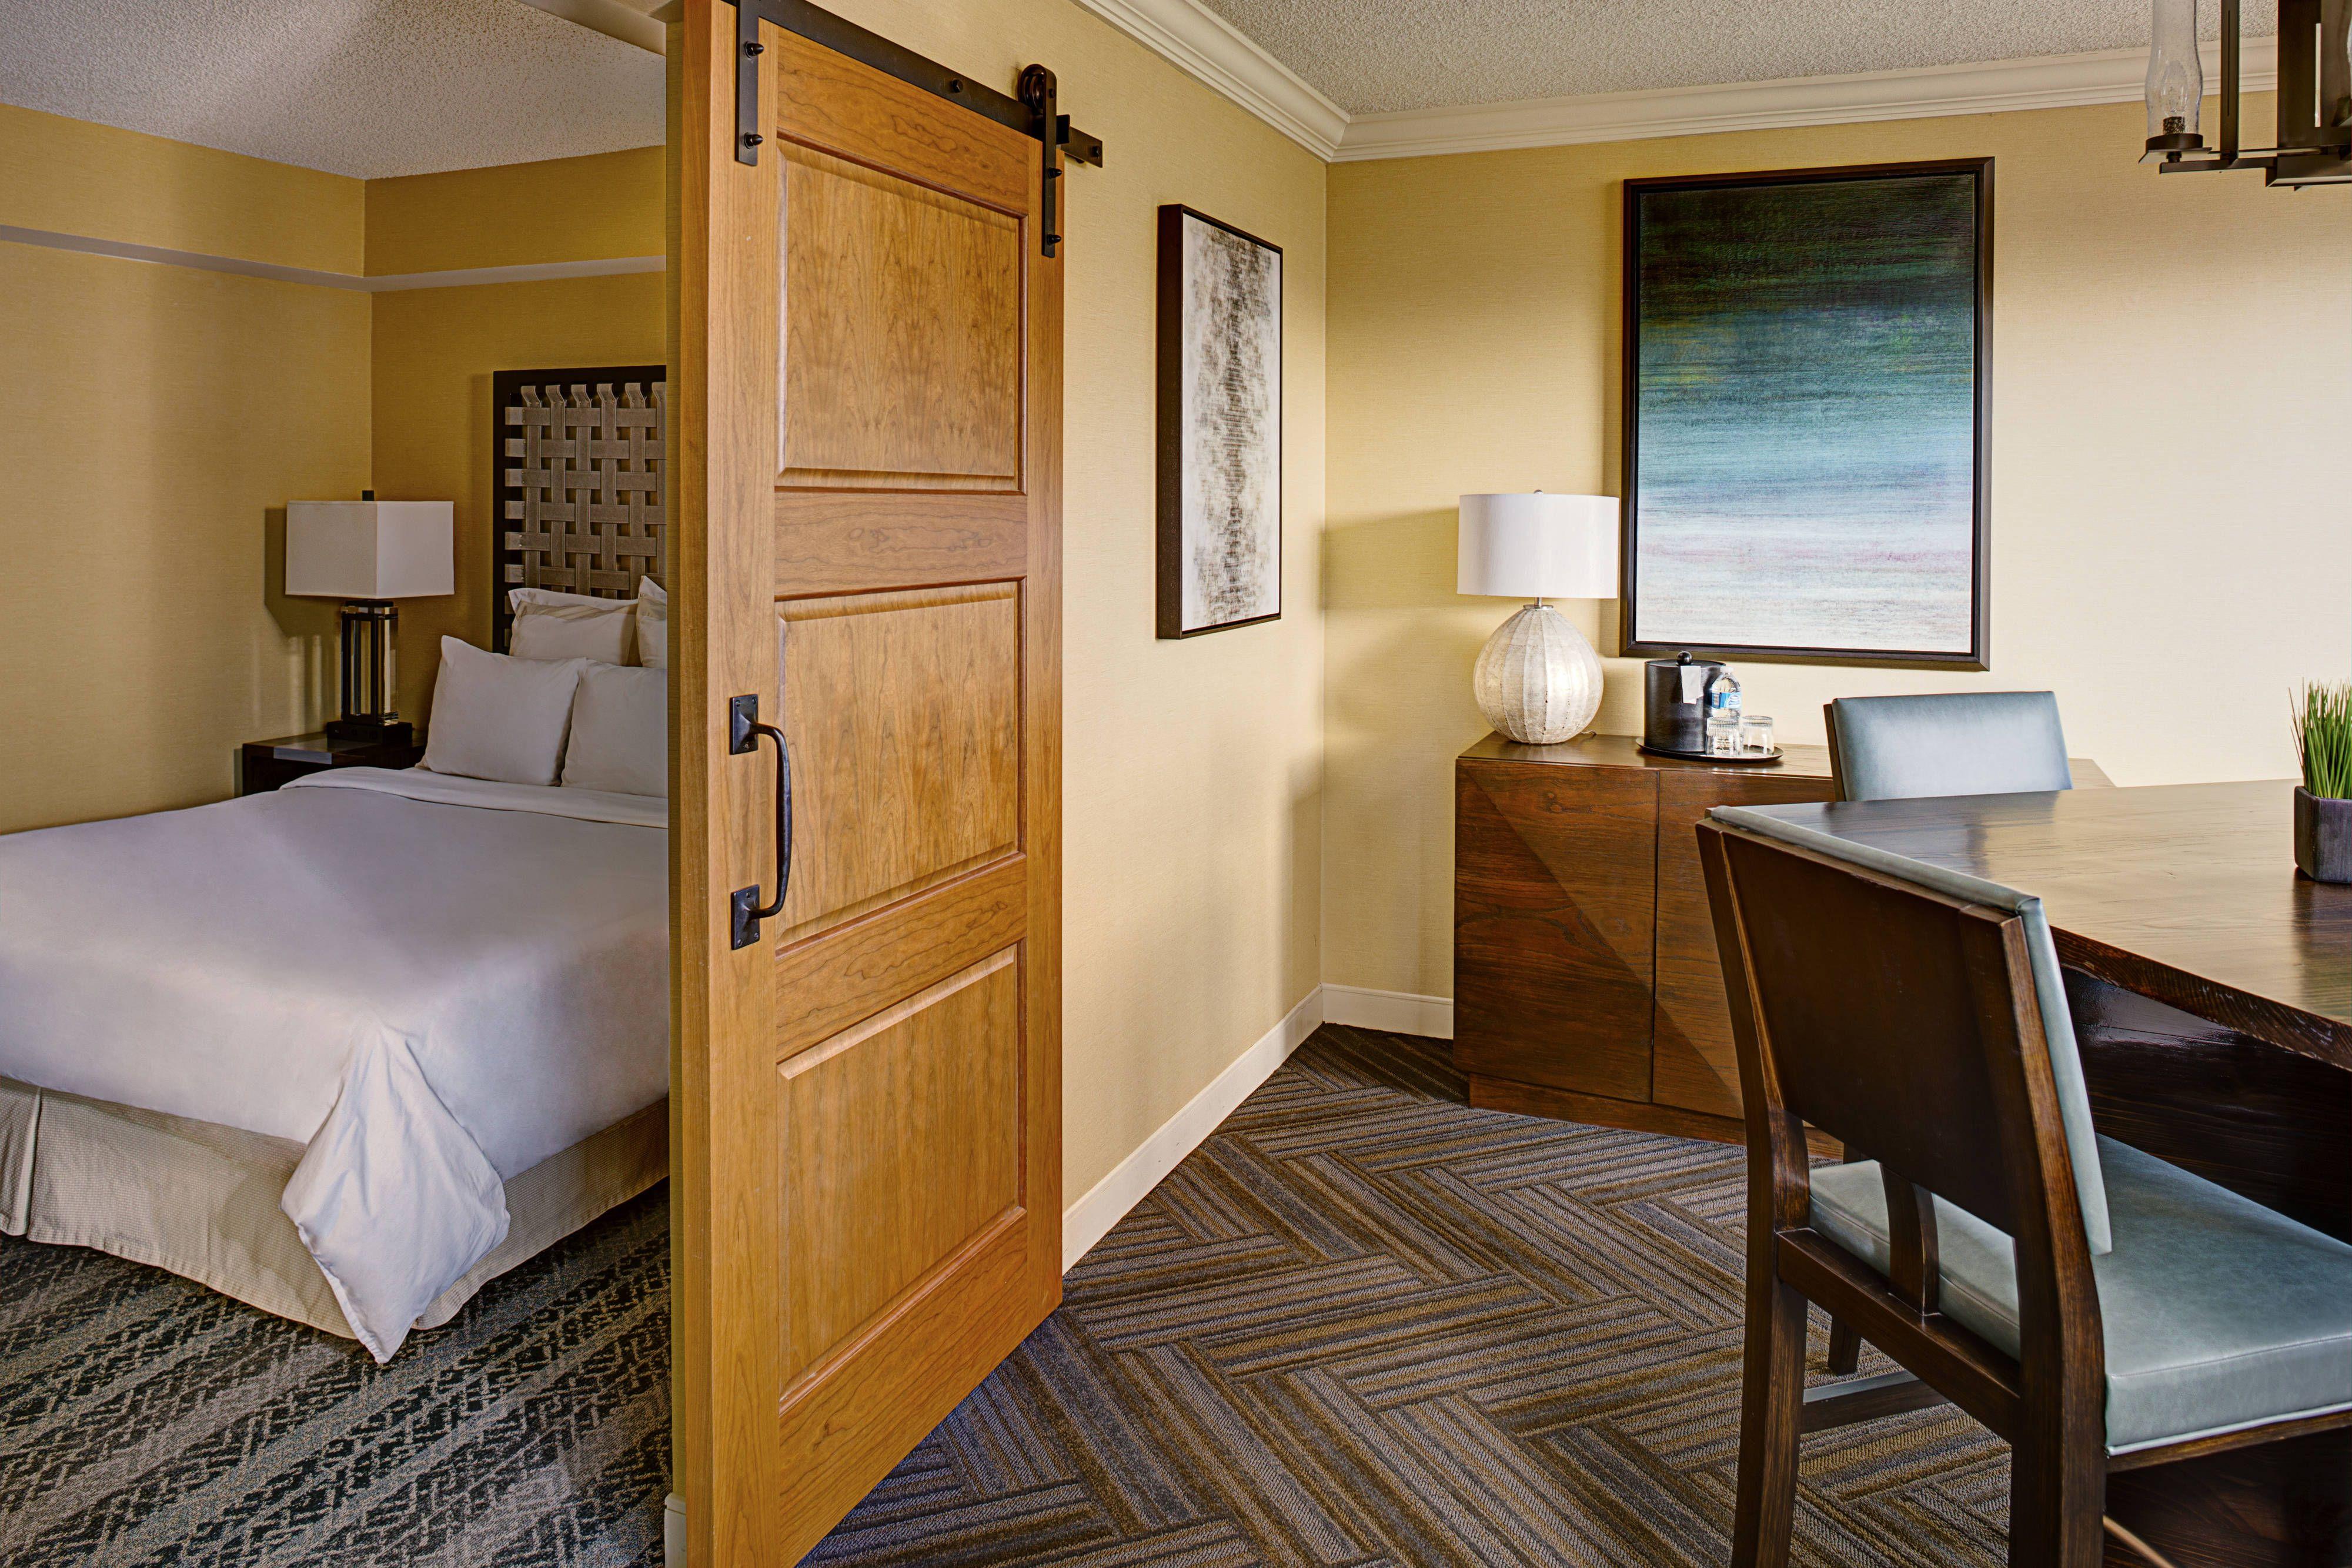 colorado springs marriott presidential suite relax beautiful rh pinterest com